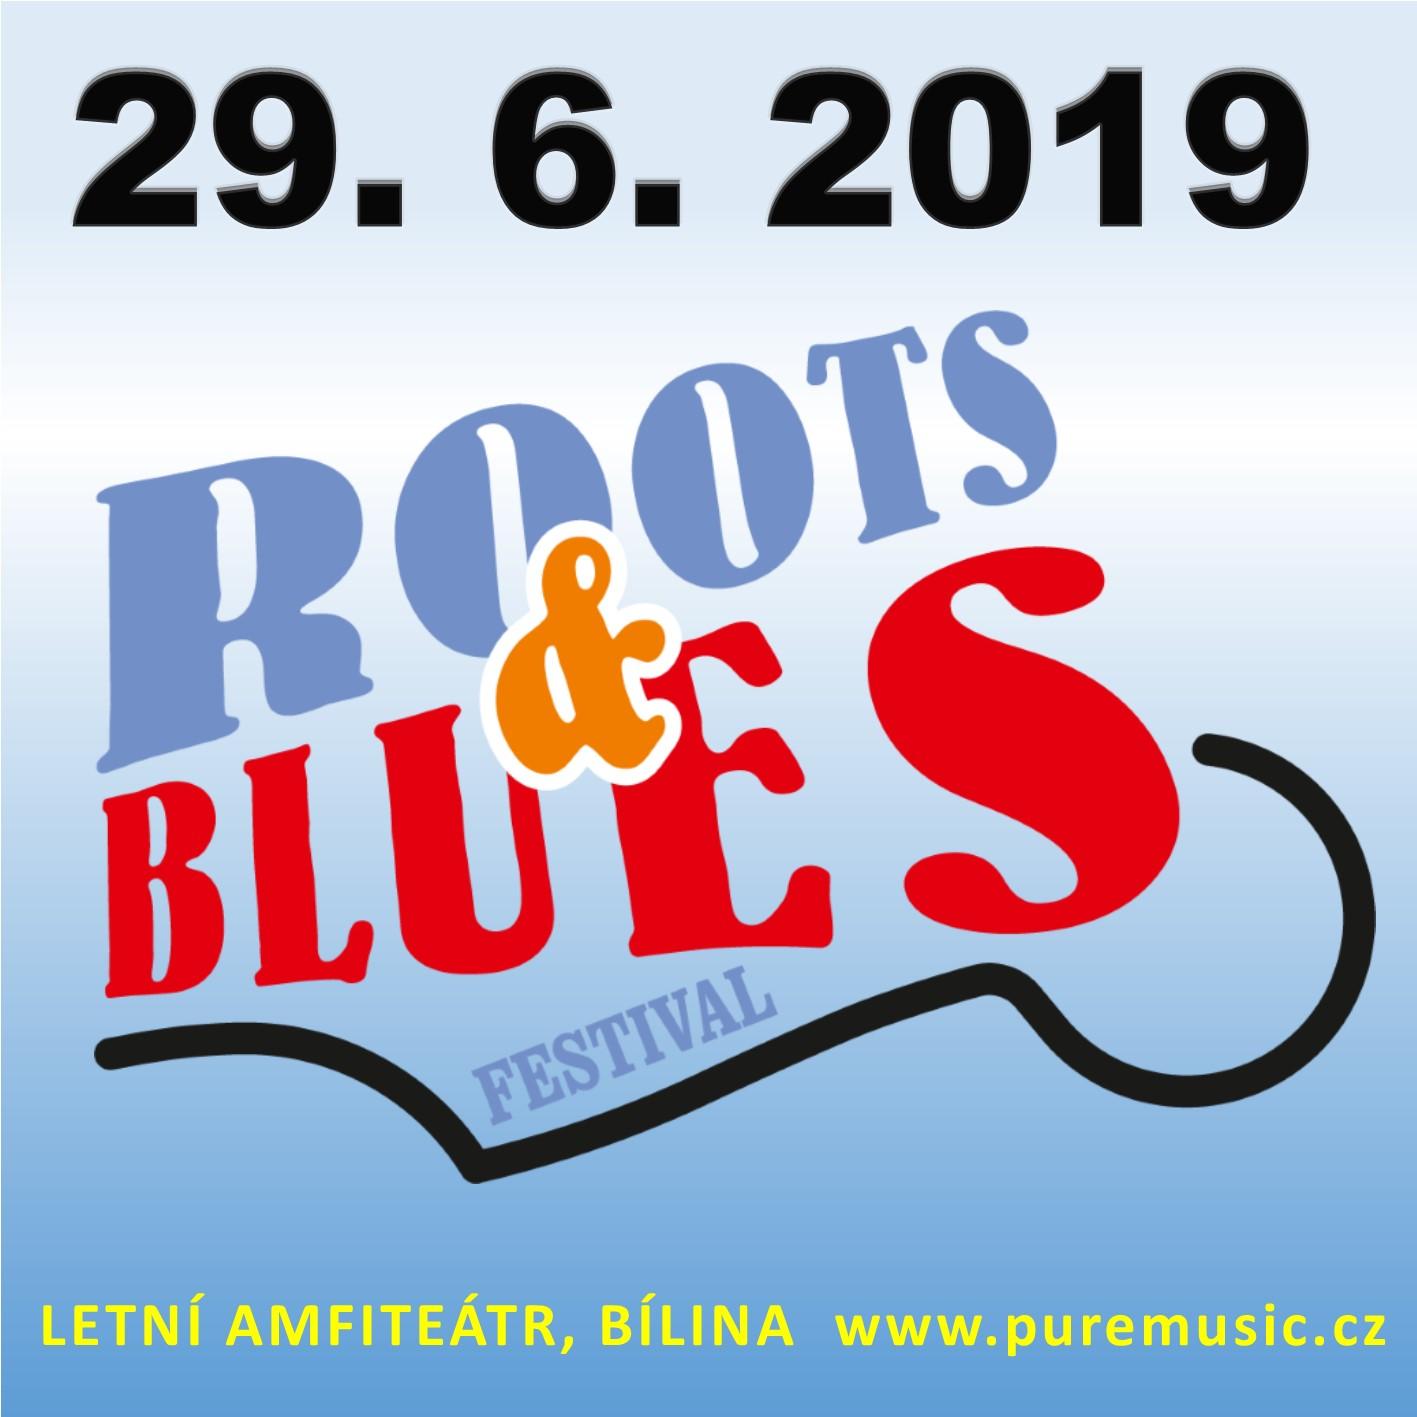 2019 - Roots & Blues festival